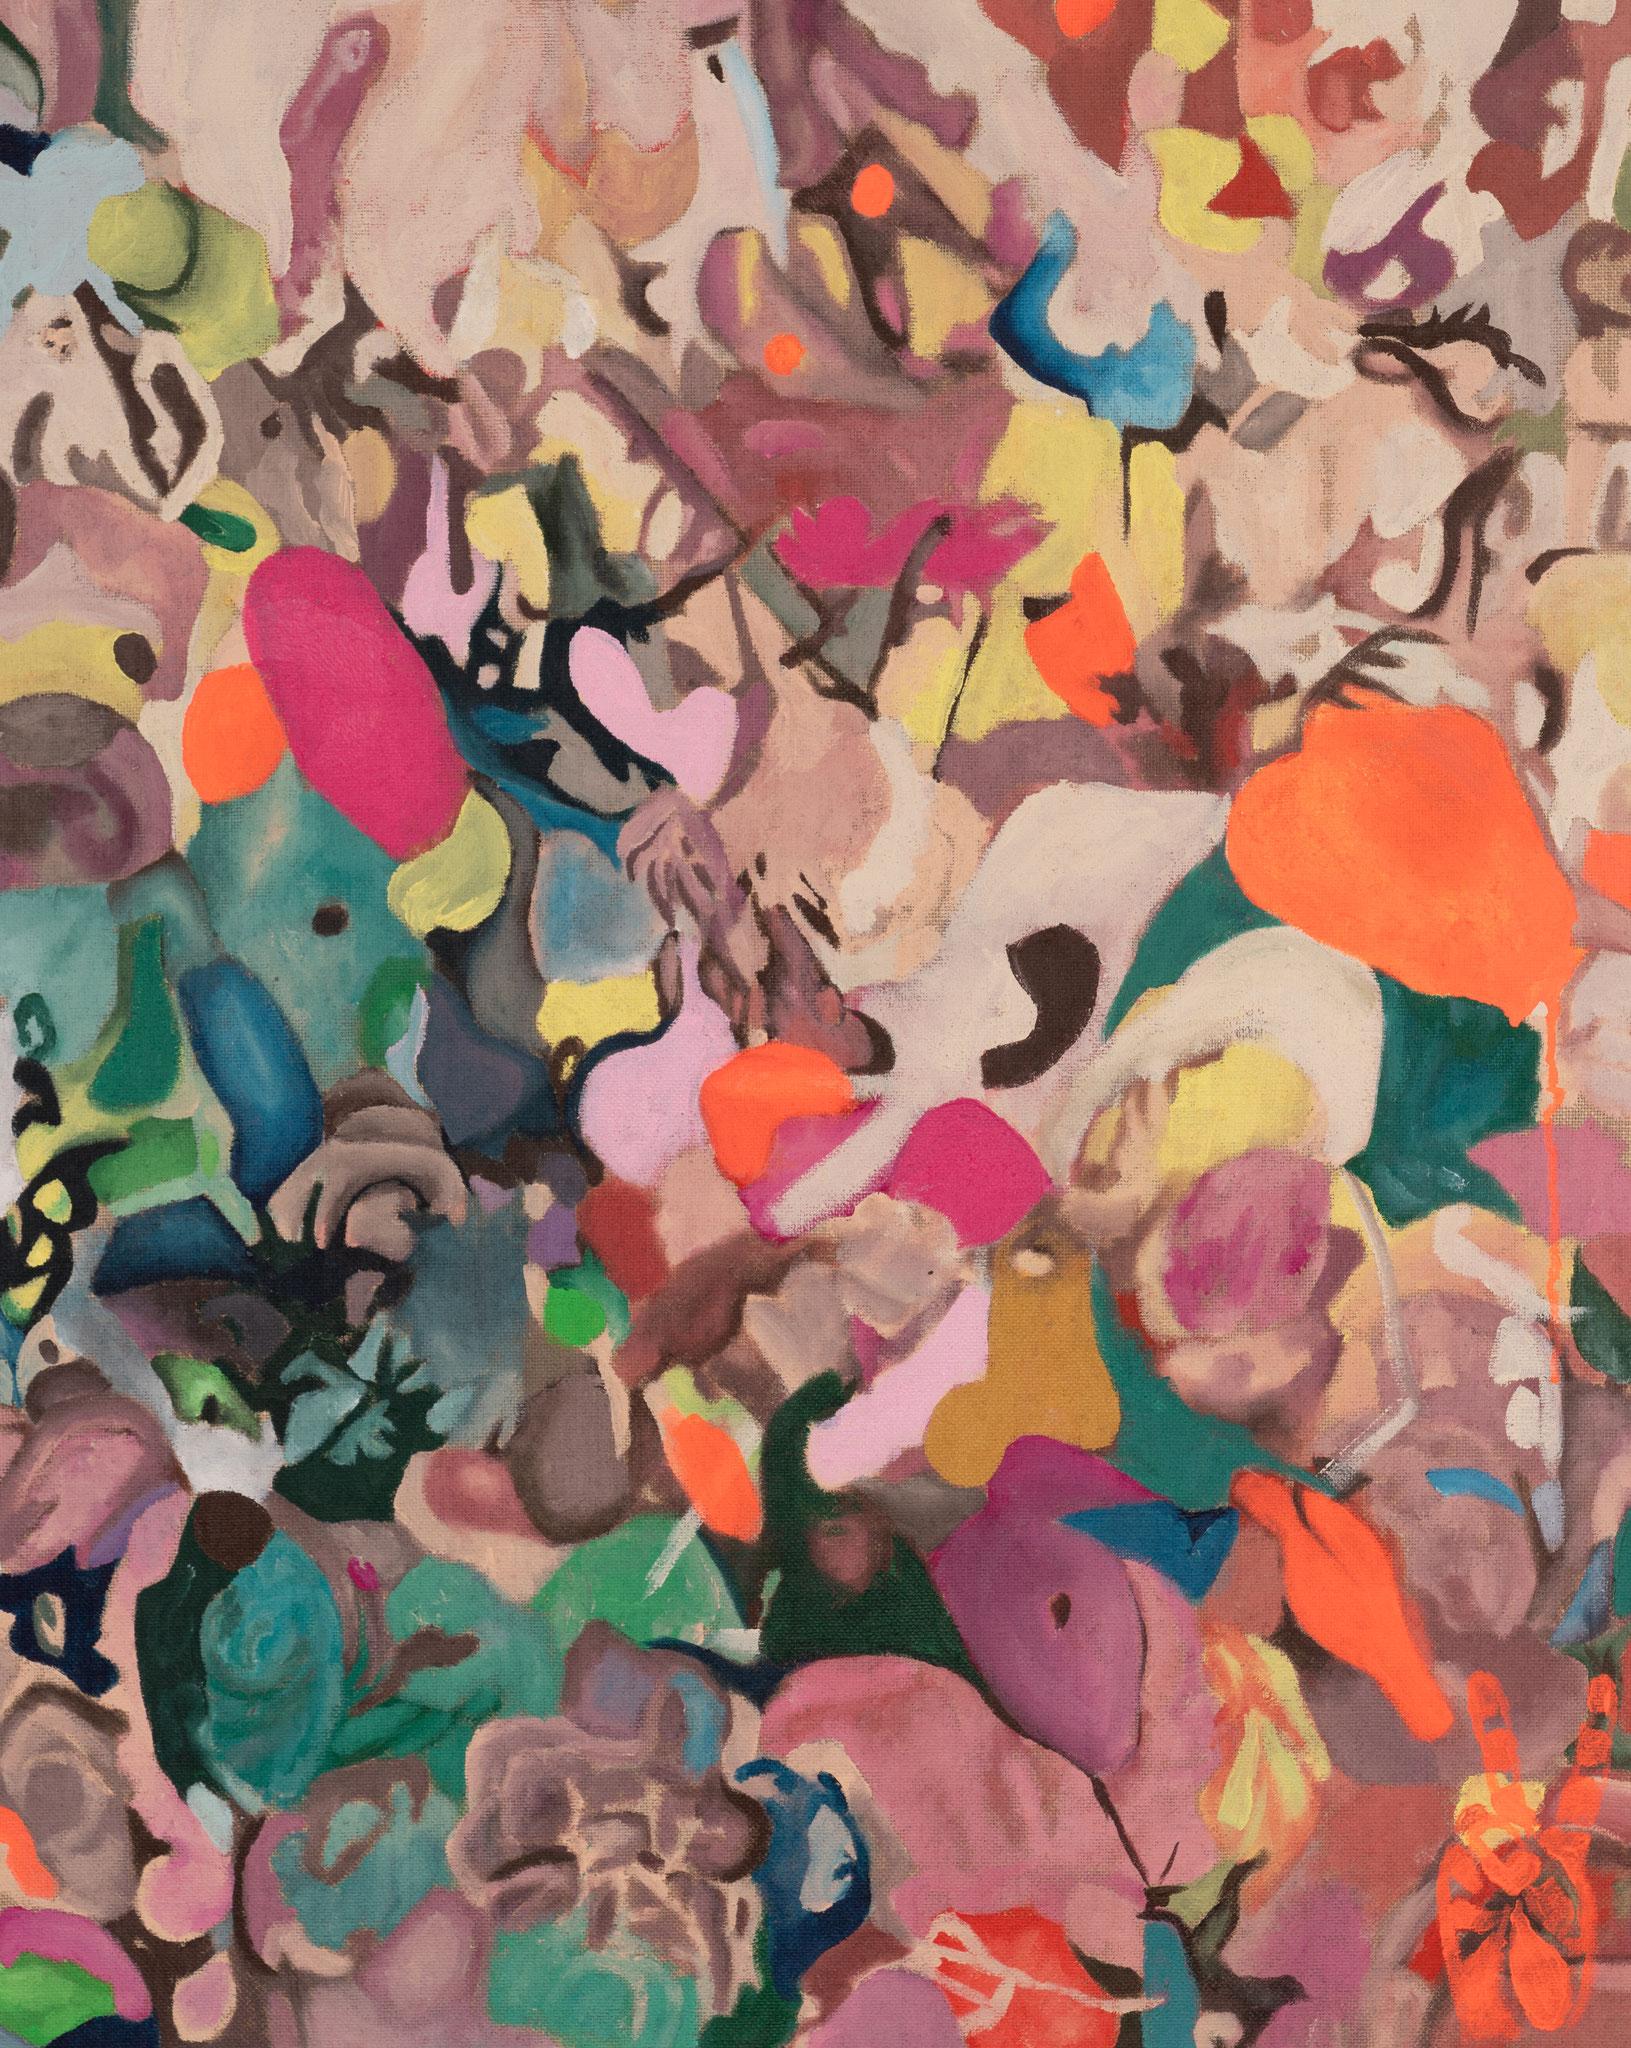 """Pink Dots"" 80 x 100 cm - Acryl auf Leinwand"